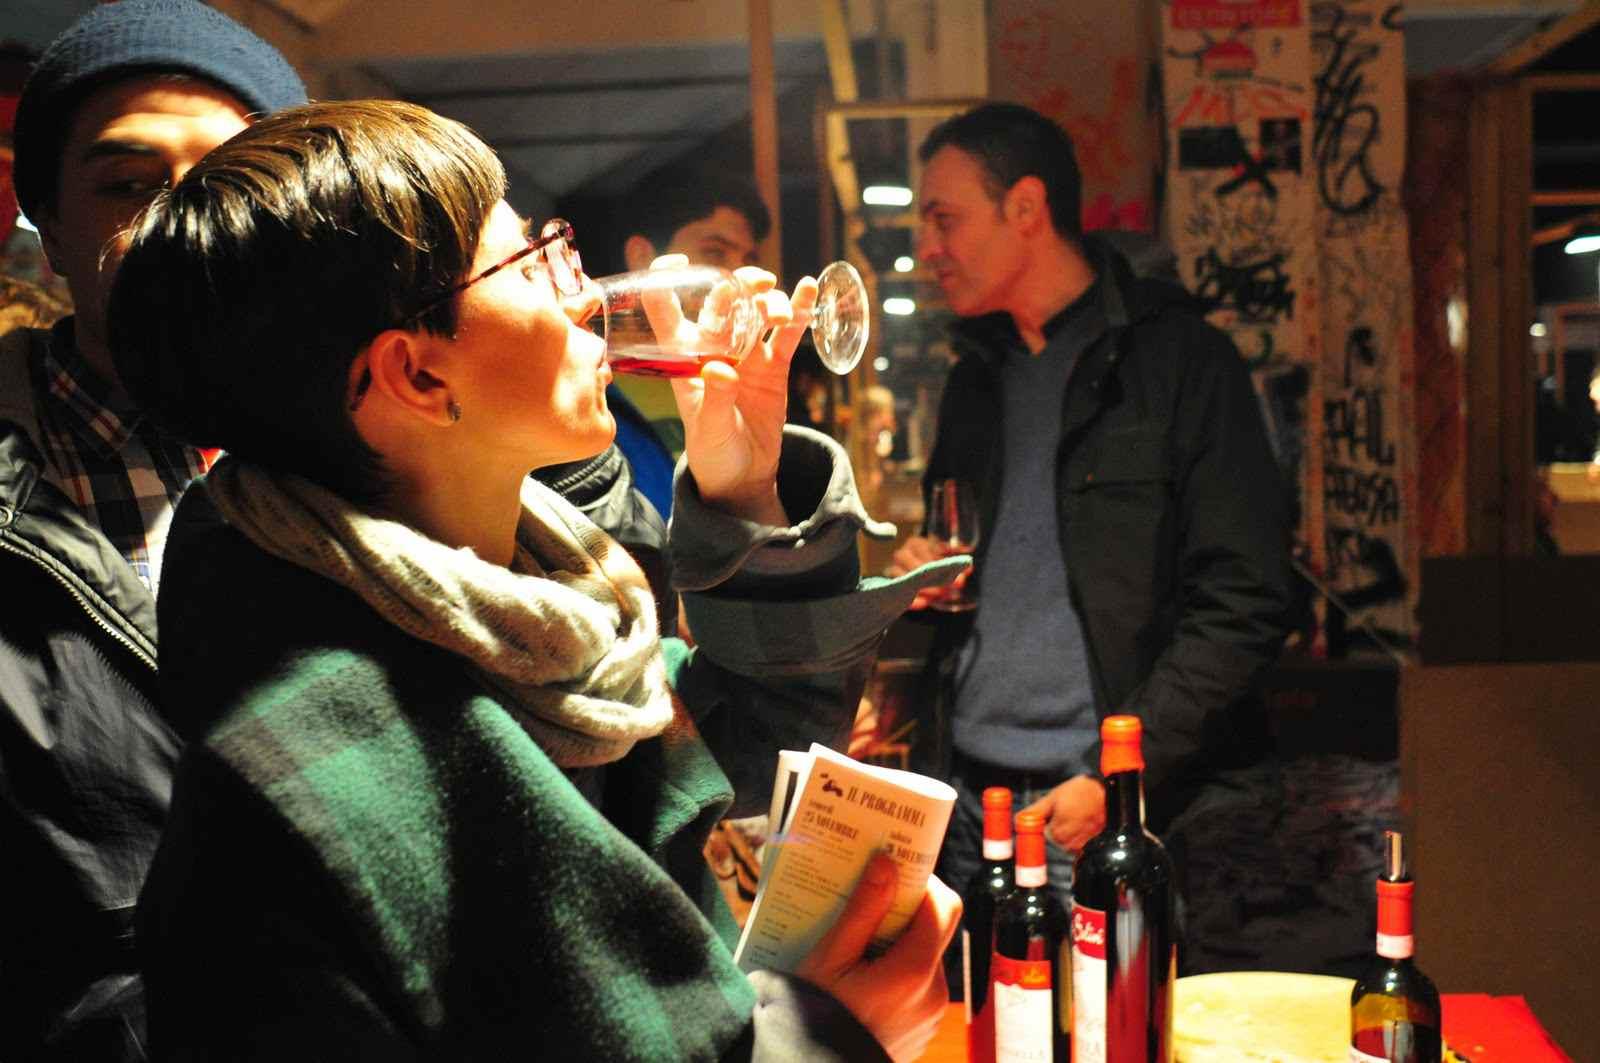 Wineatvie milano eventi centro storico